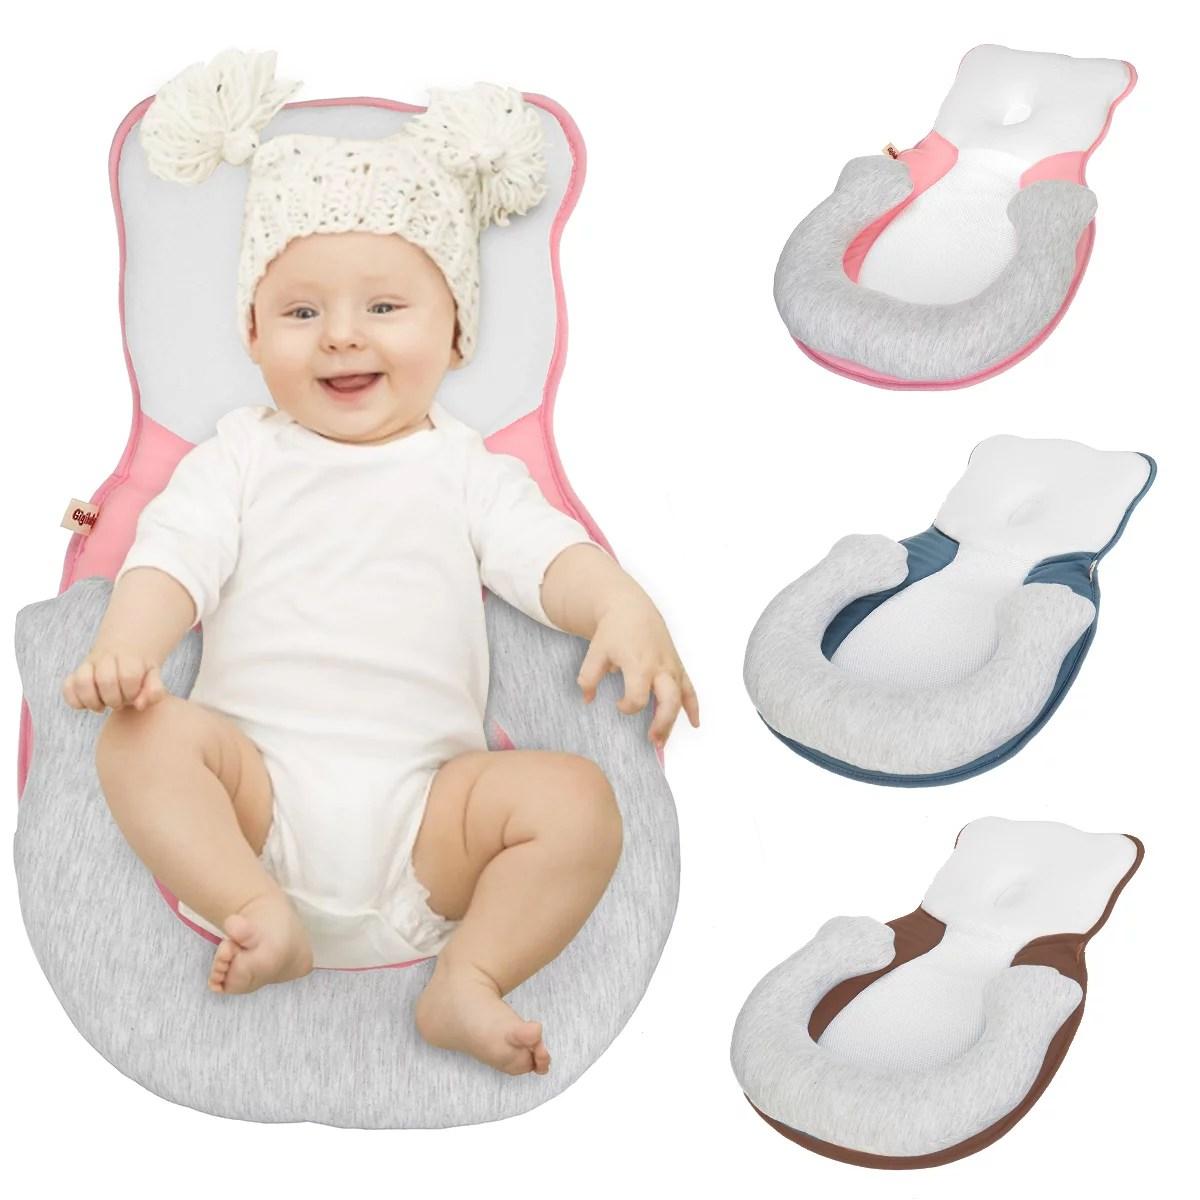 soft newborn baby infant sleep positioner prevent flat head shape anti roll pillow prevent flat head sleep mattress